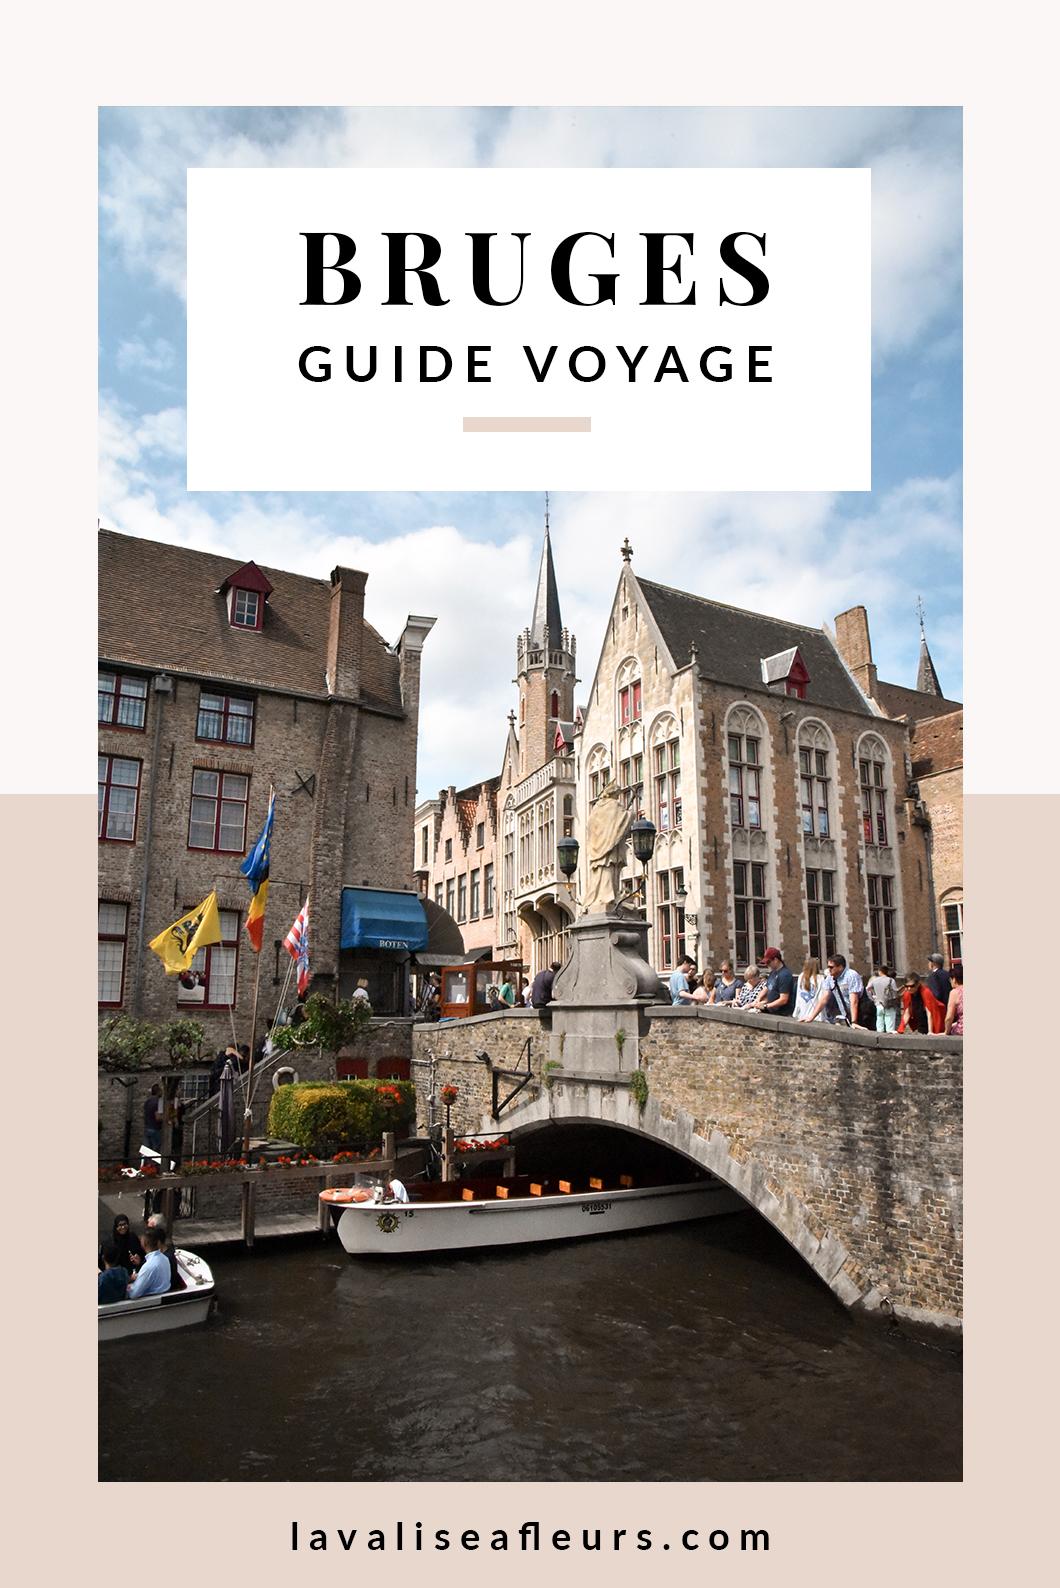 Guide voyage de Bruges en Belgique